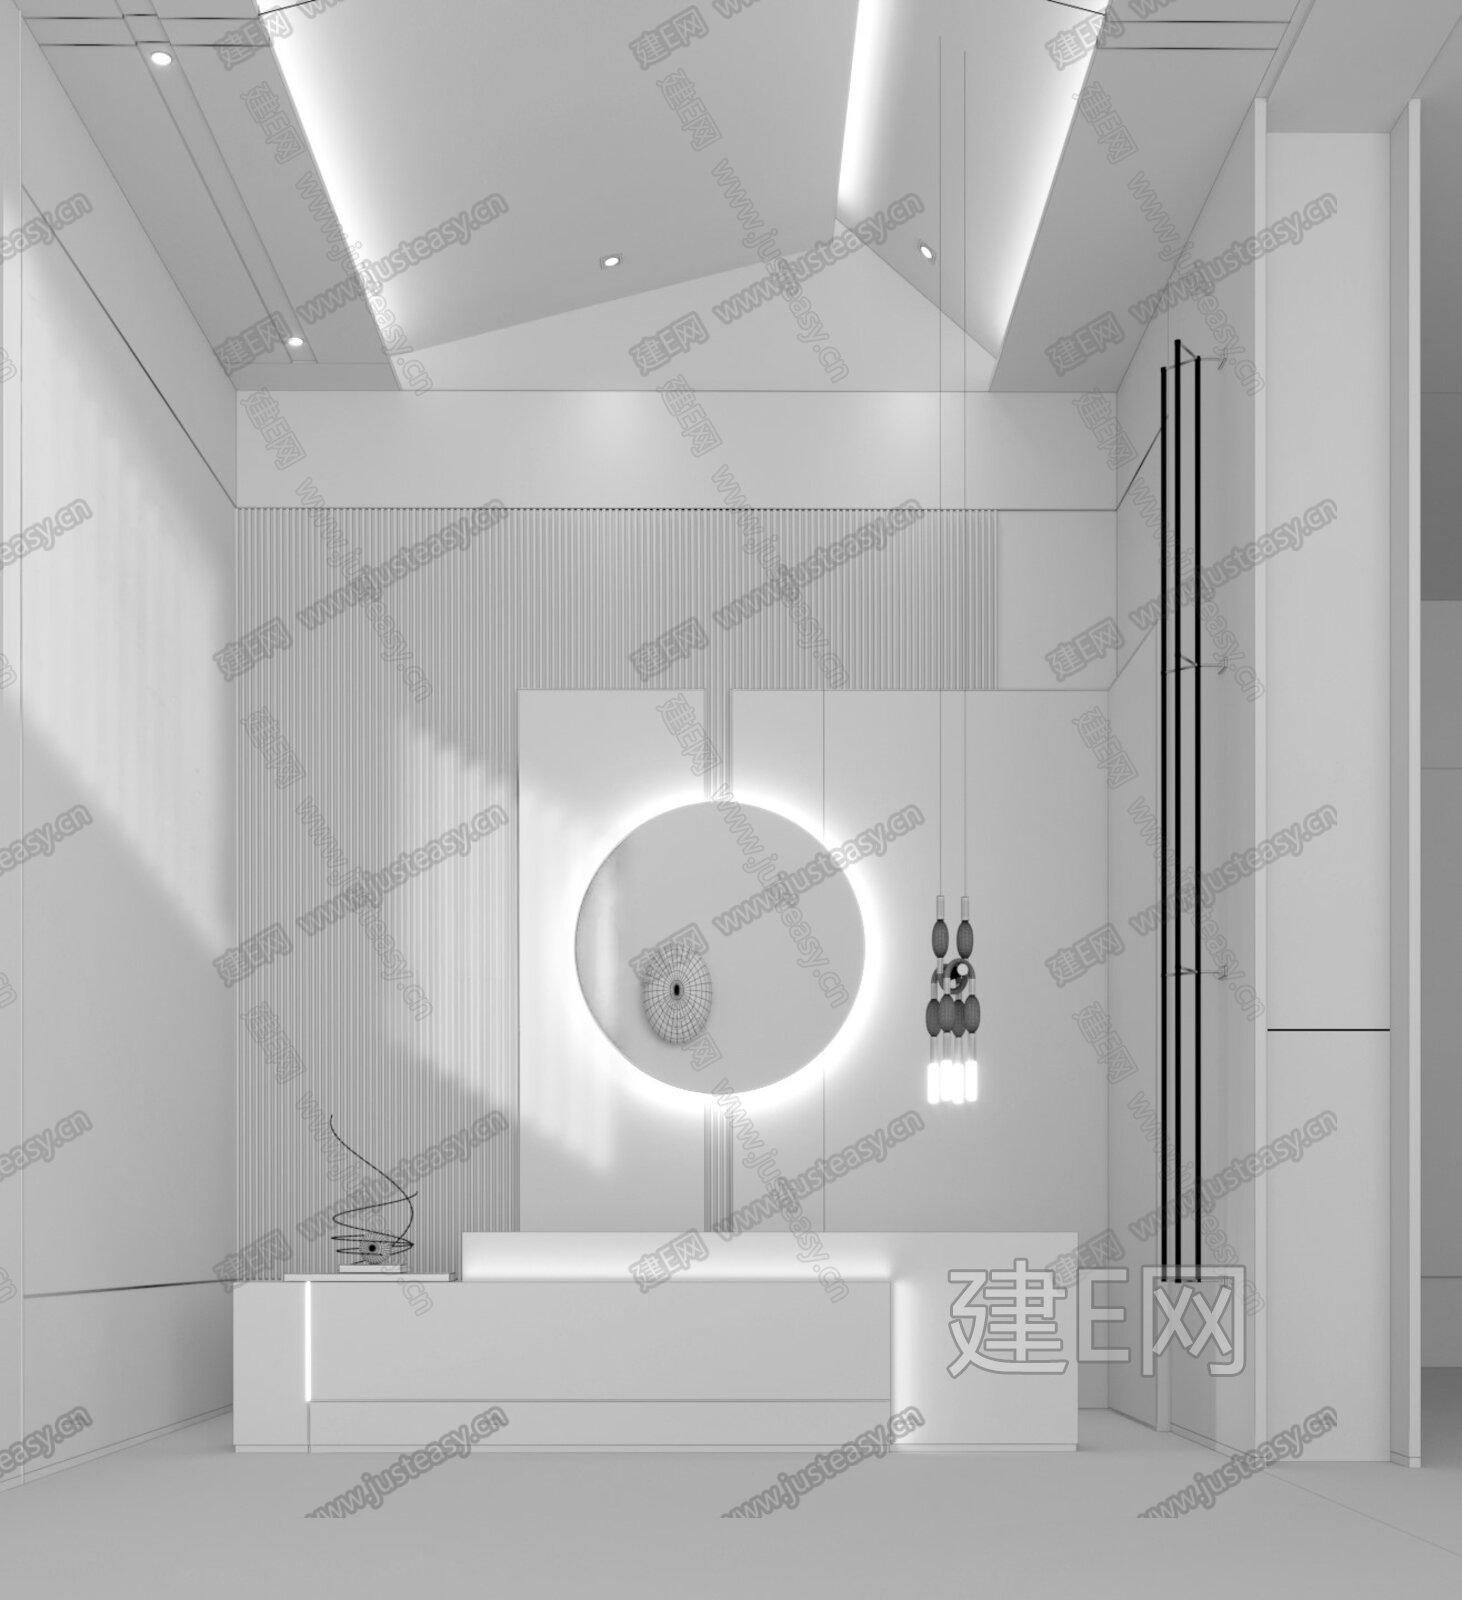 IF DESIGN 羽果设计 现代售楼处前台3d模型